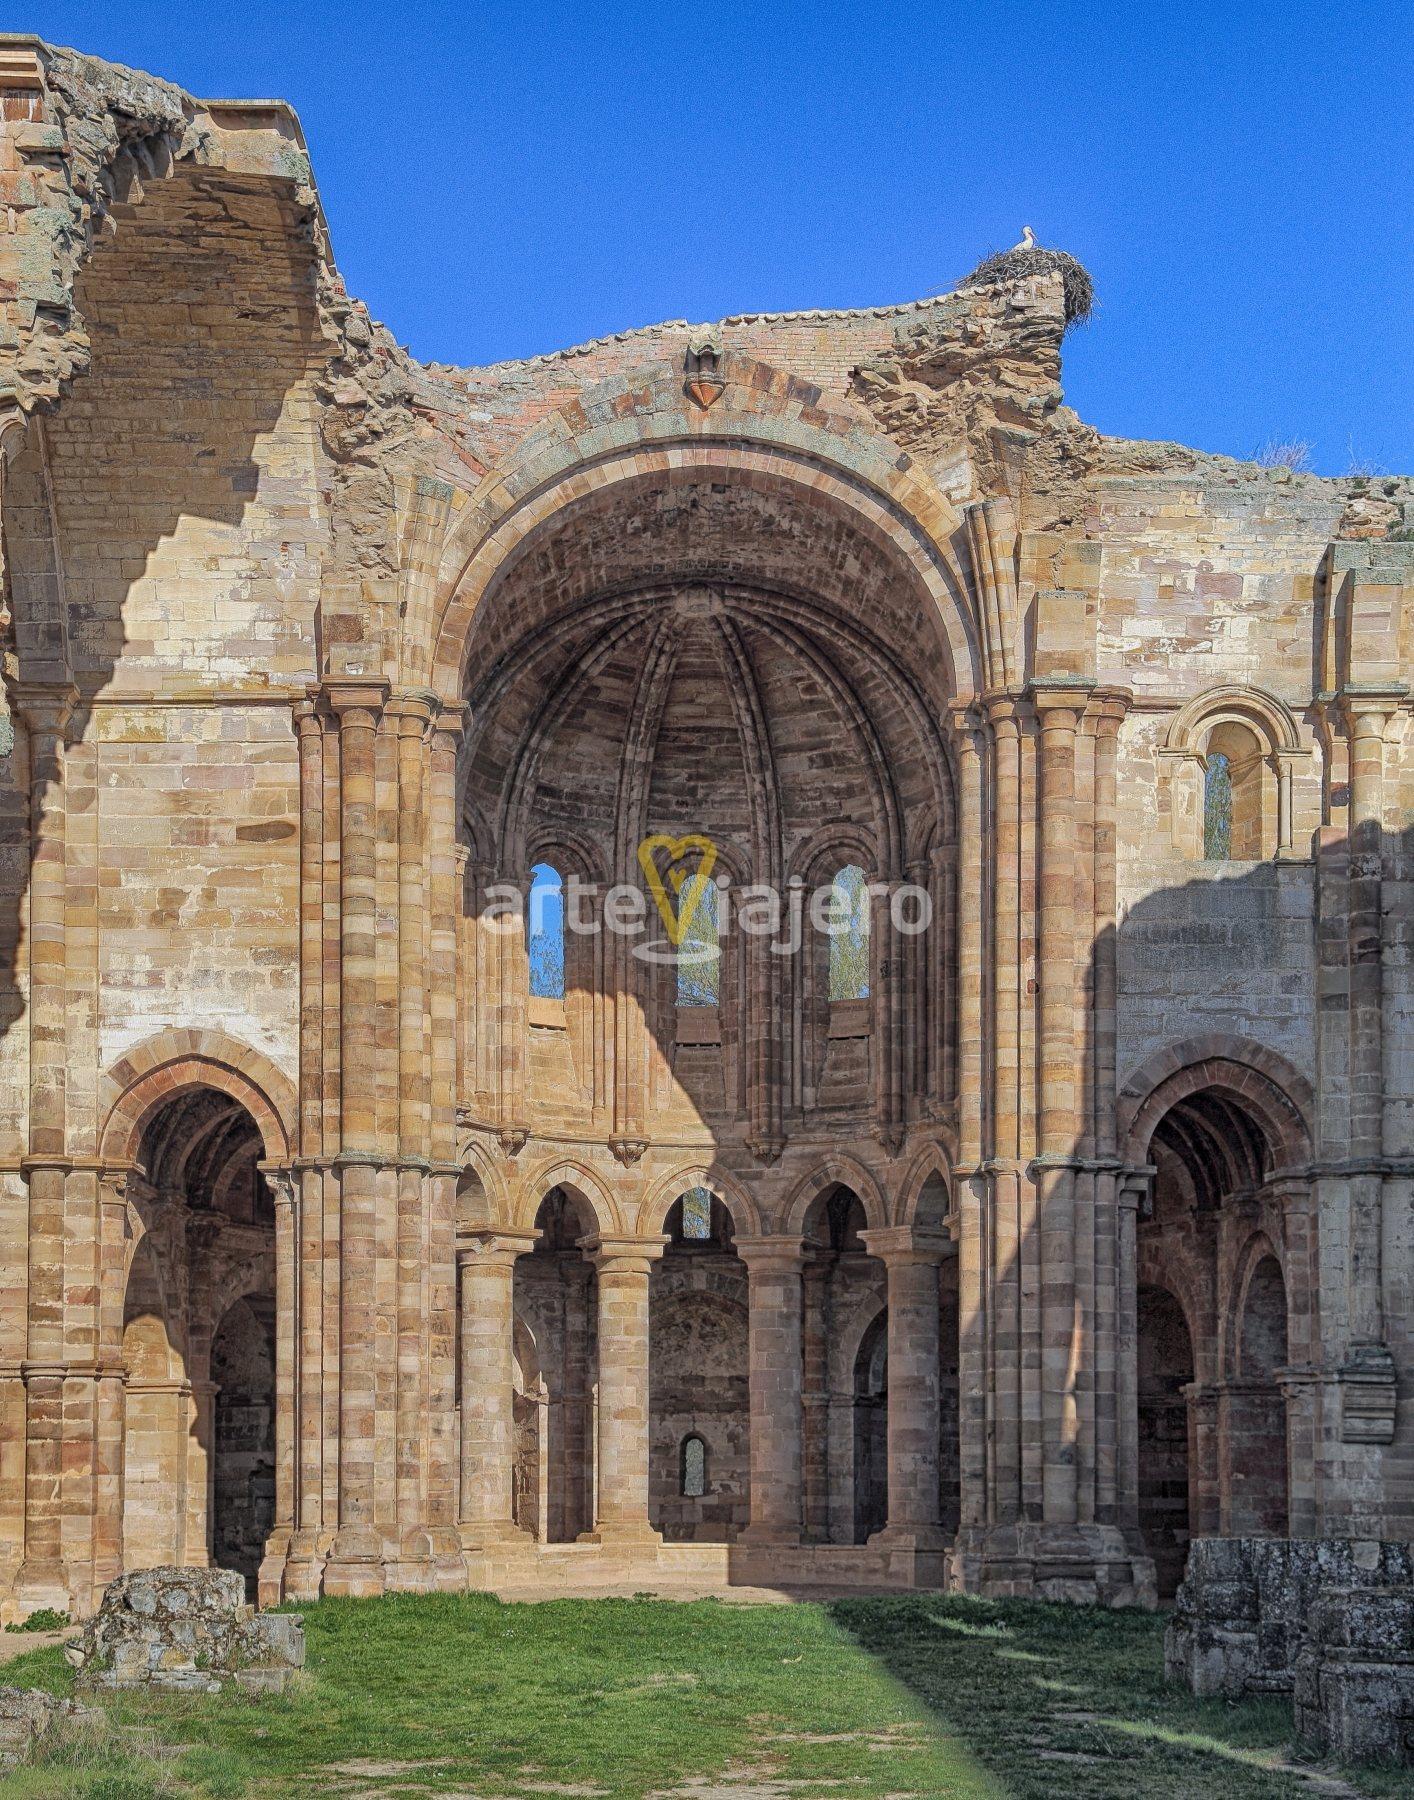 monasterio de moreruela